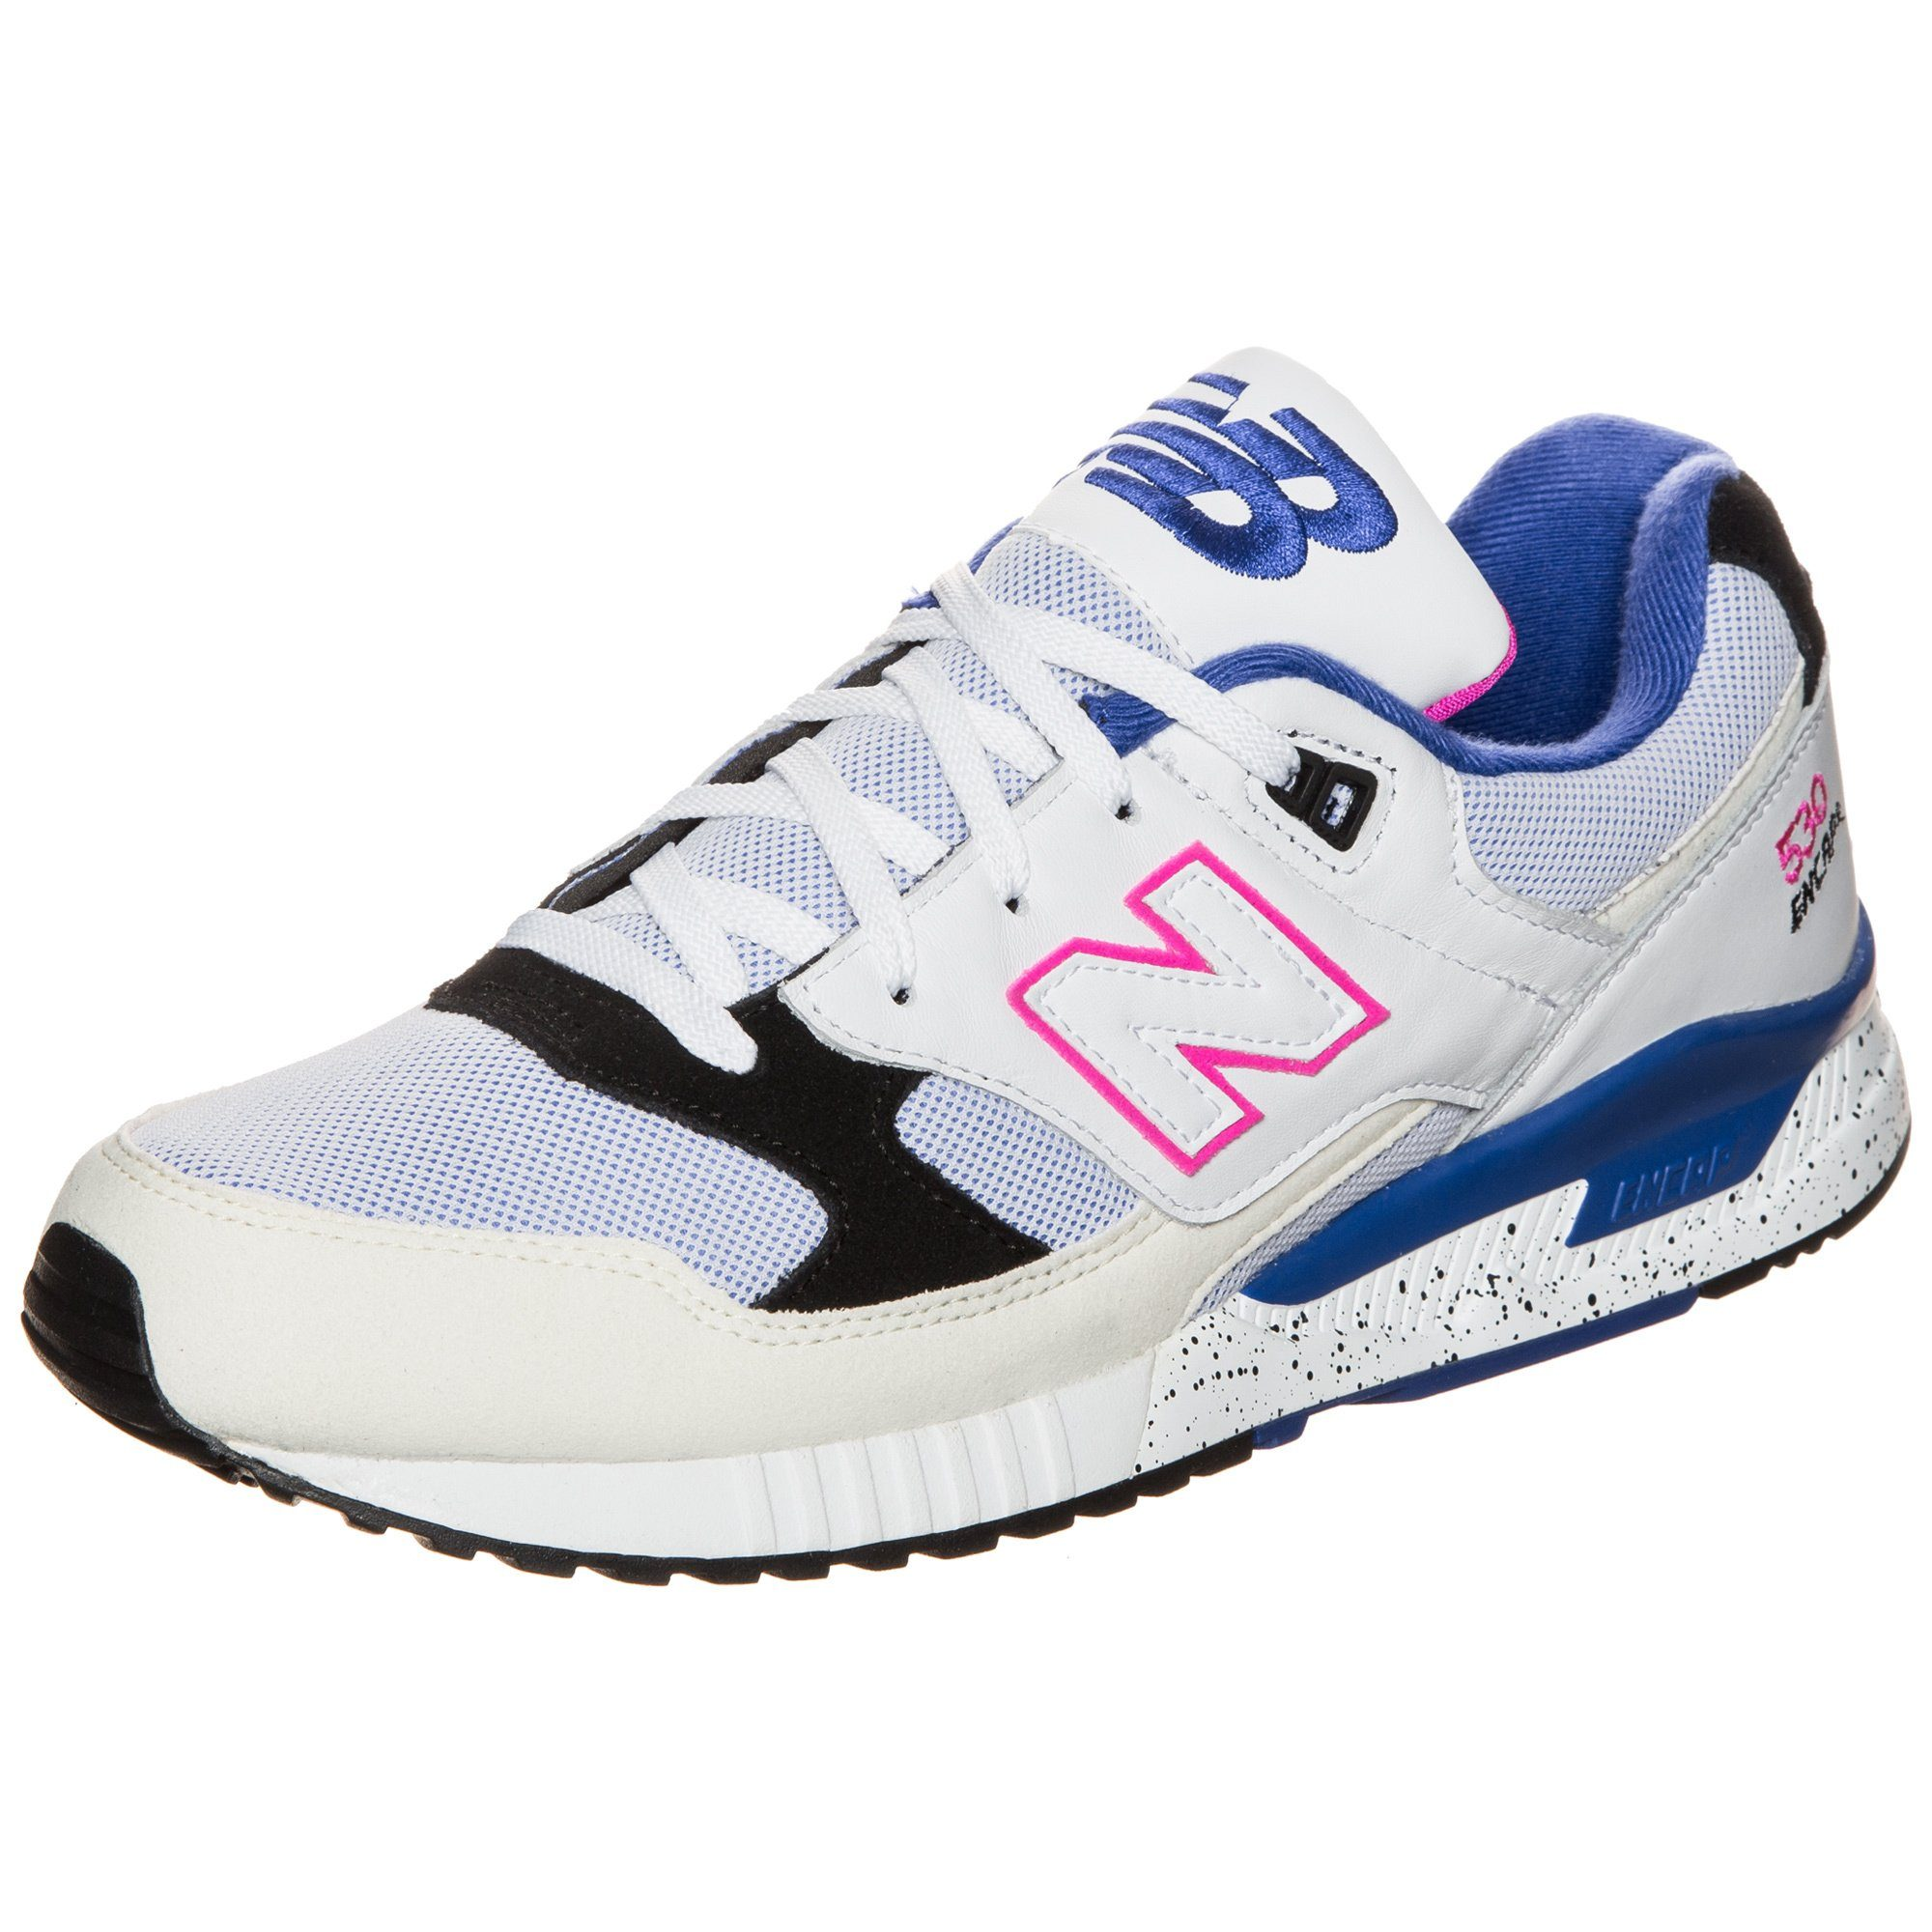 33942cb04a0fba Sneakers High Herren. Bildquelle  New Balance M530-KIE-D Sneaker